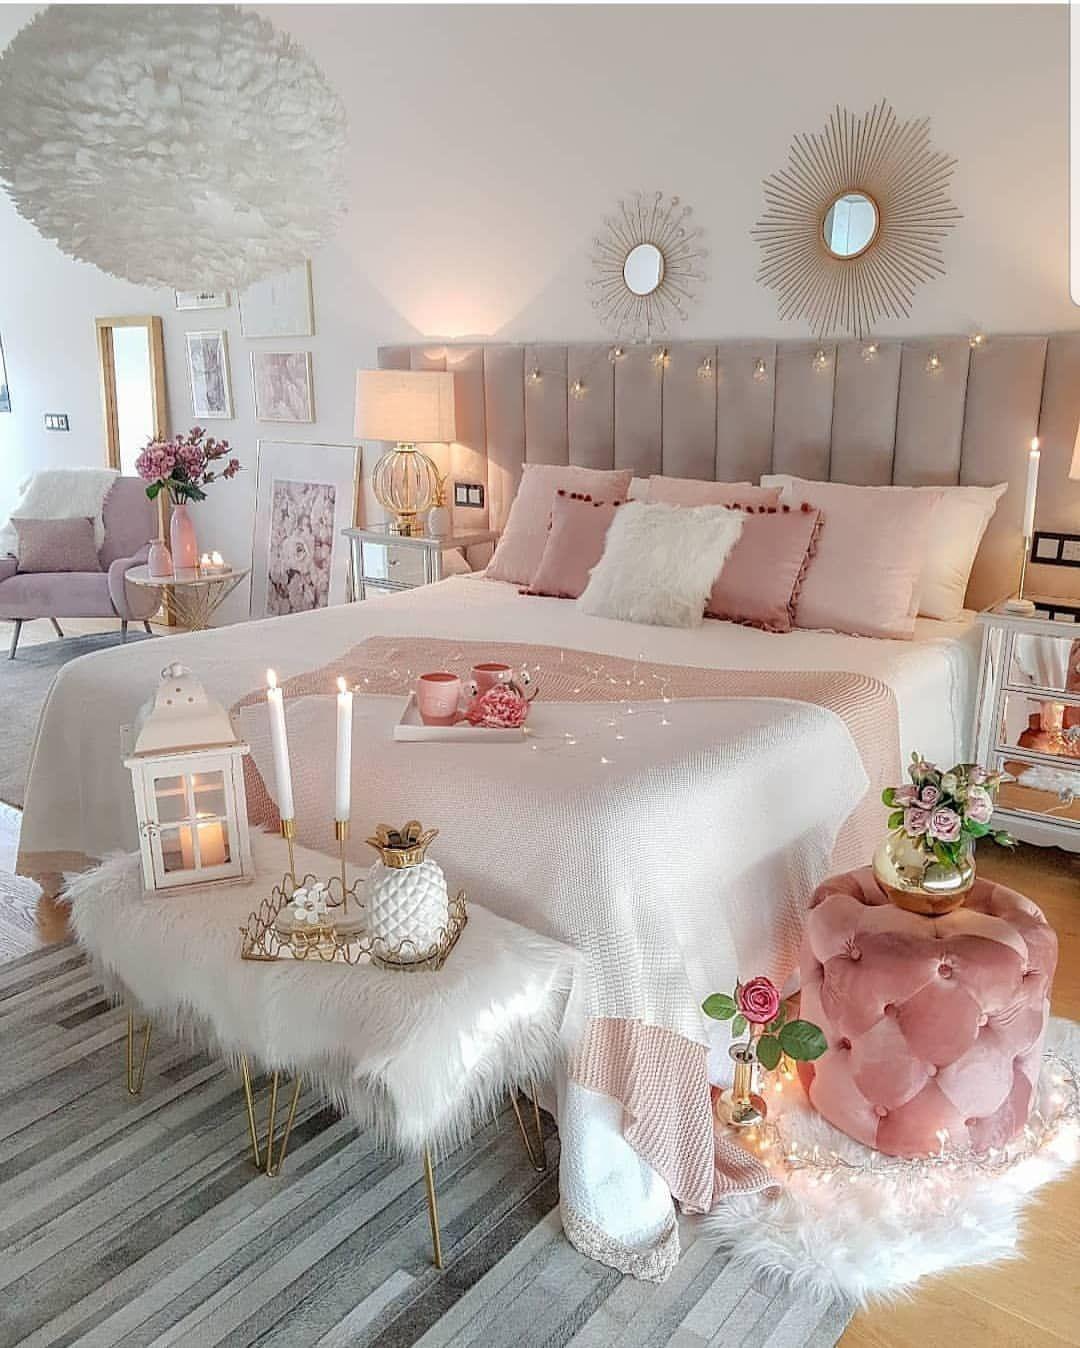 Creme Tamishome Bedroomdecor Bedroom Inspire Me Home Decor